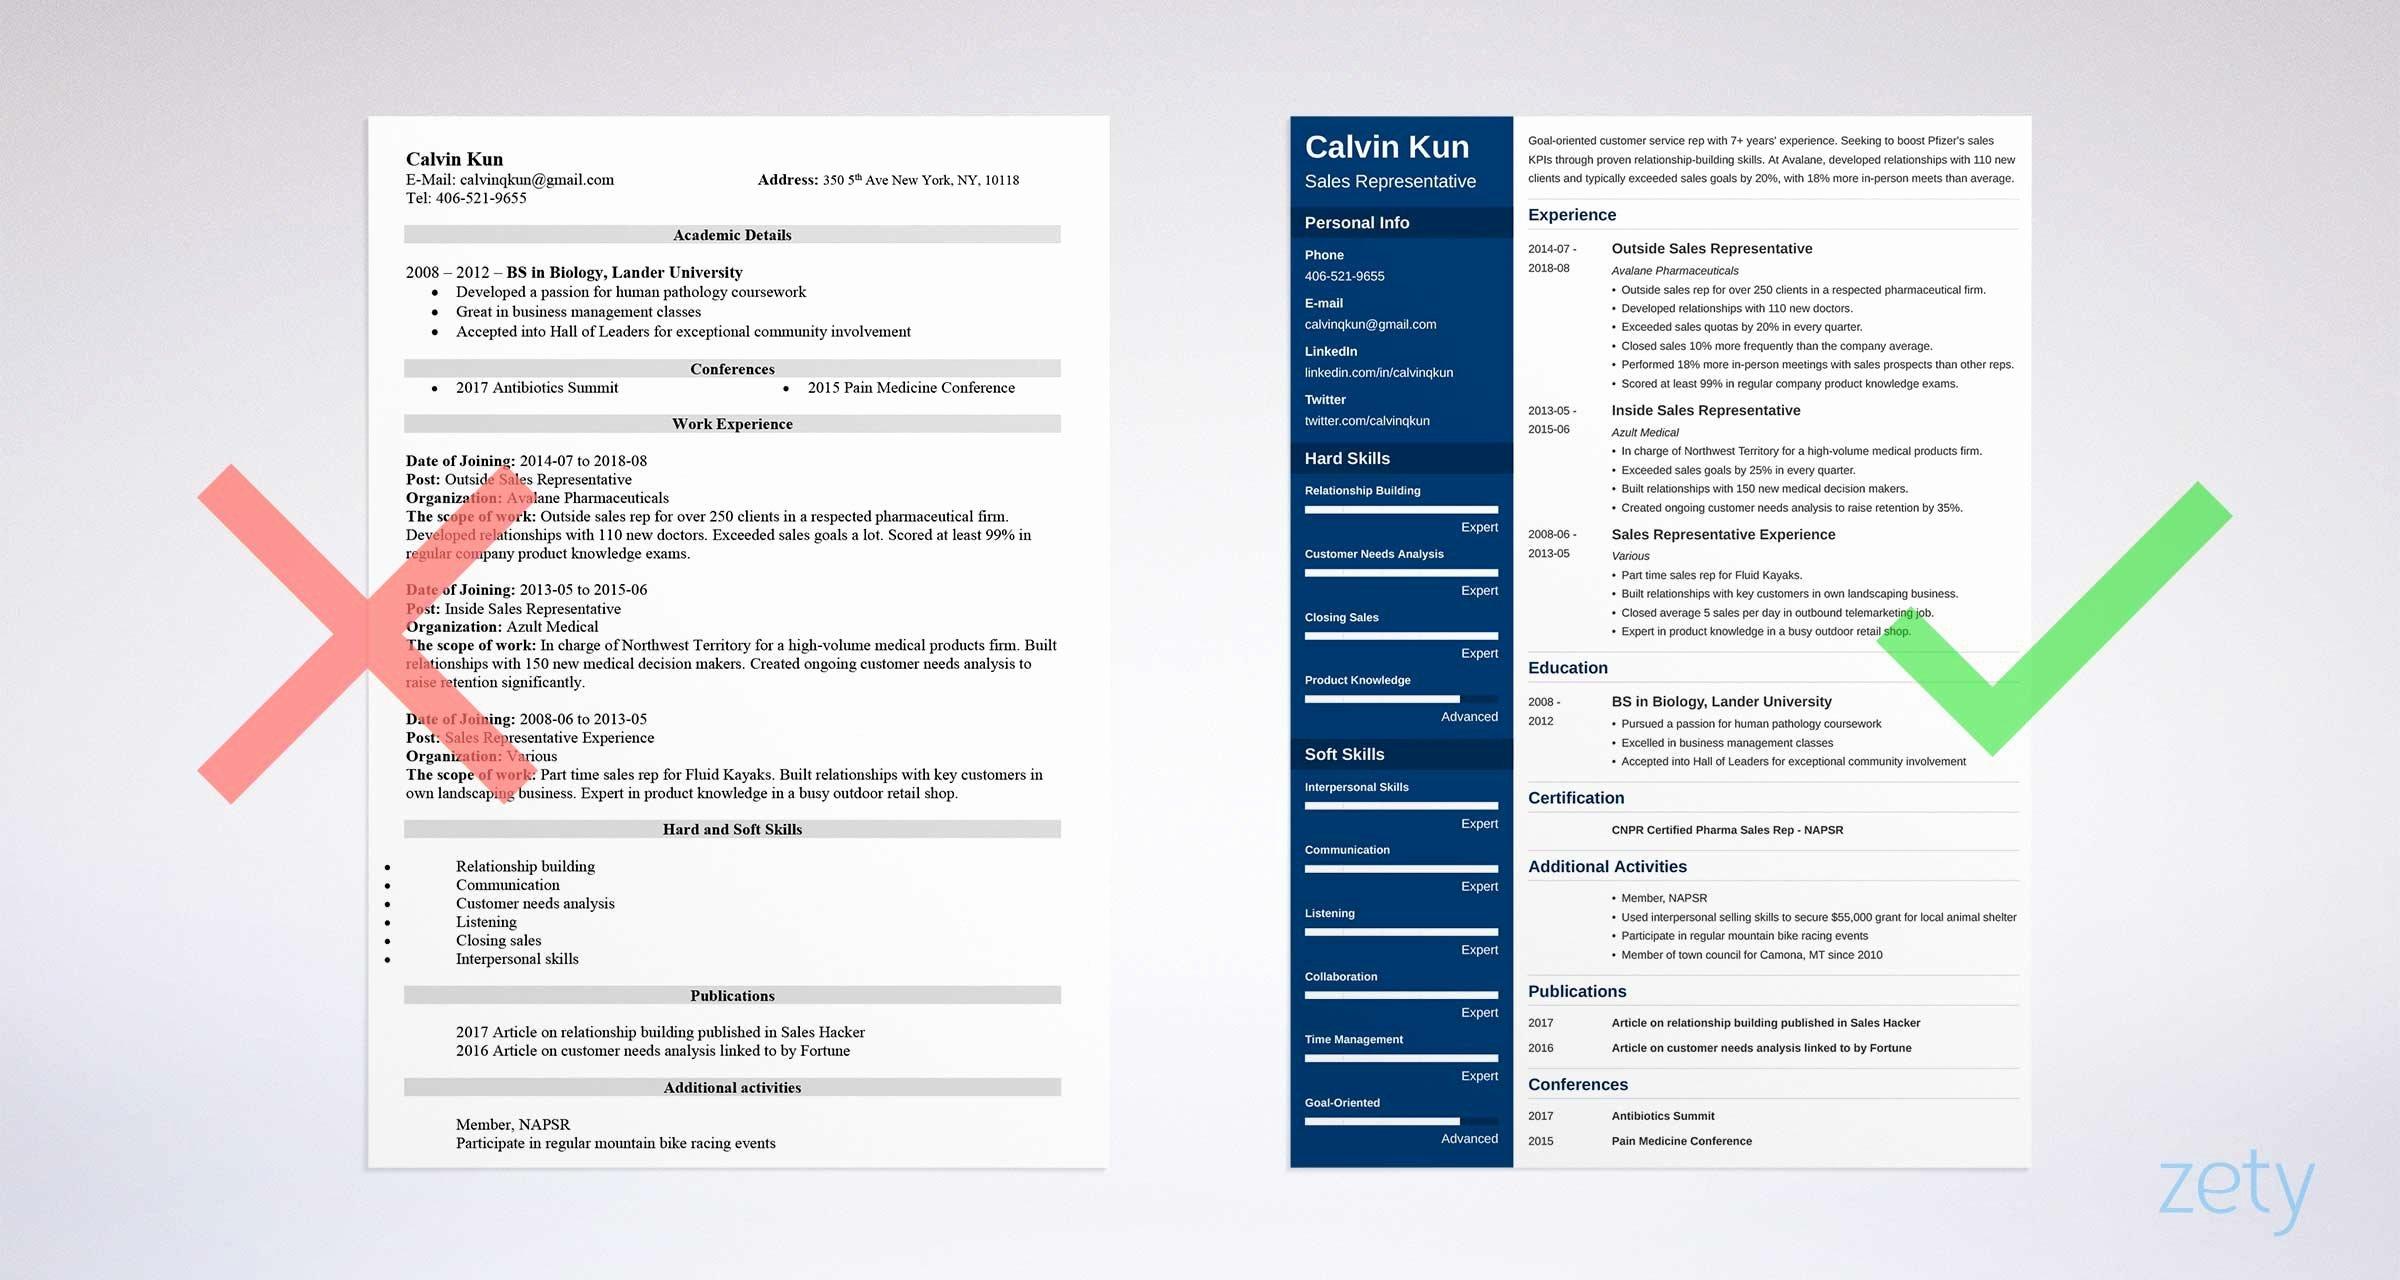 Resume for Sales Representative Position Awesome Sales Representative Resume Sample & Writing Guide [20